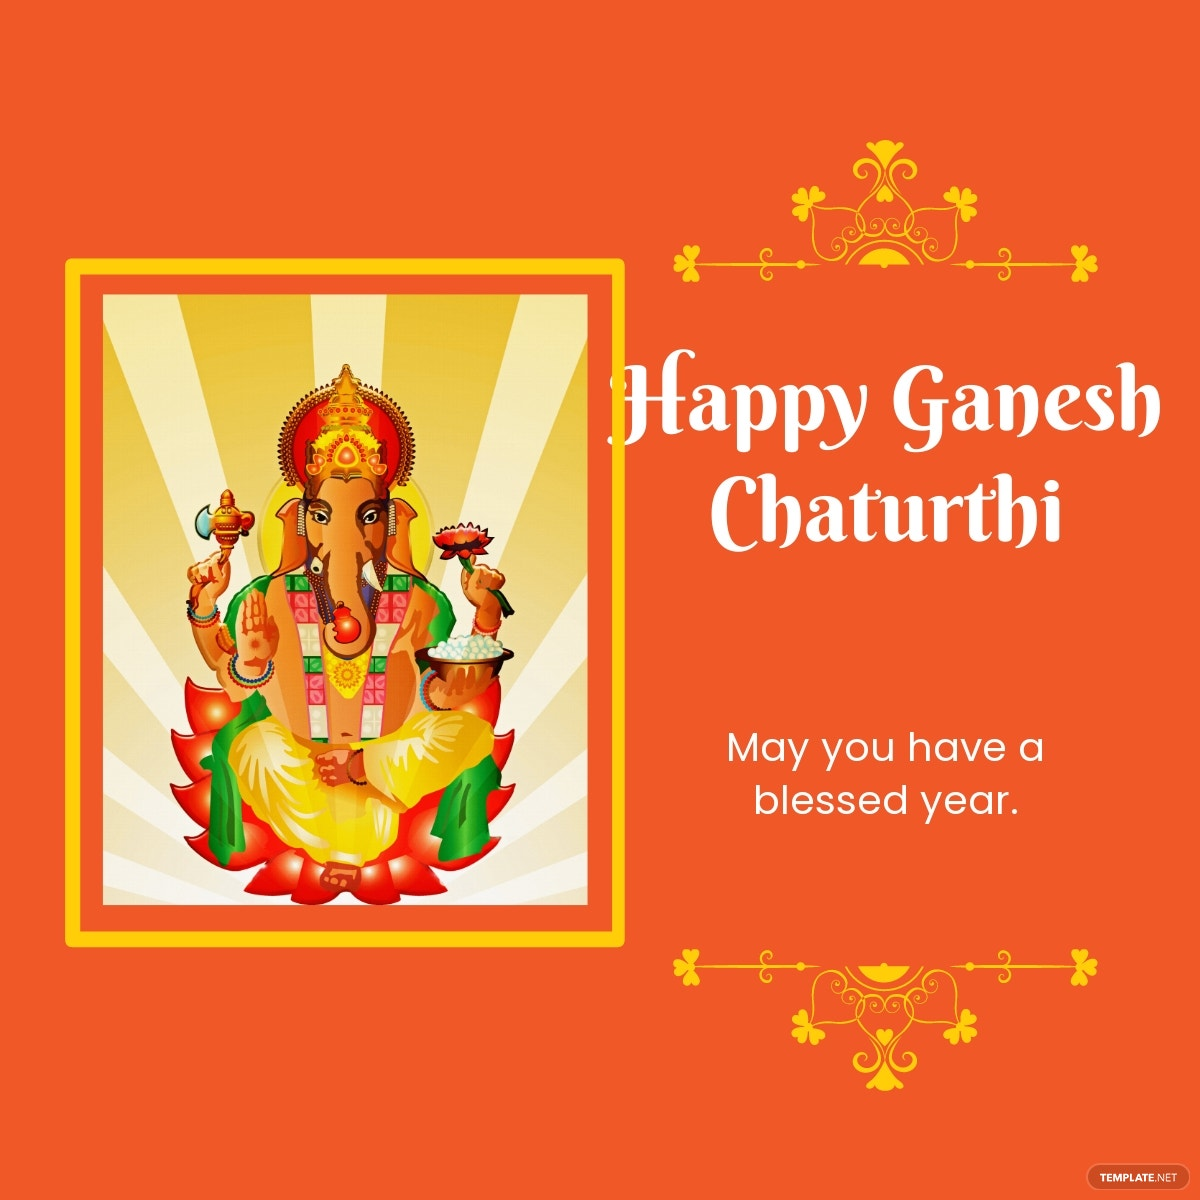 Happy Ganesh Chaturthi Linkedin Post Template.jpe